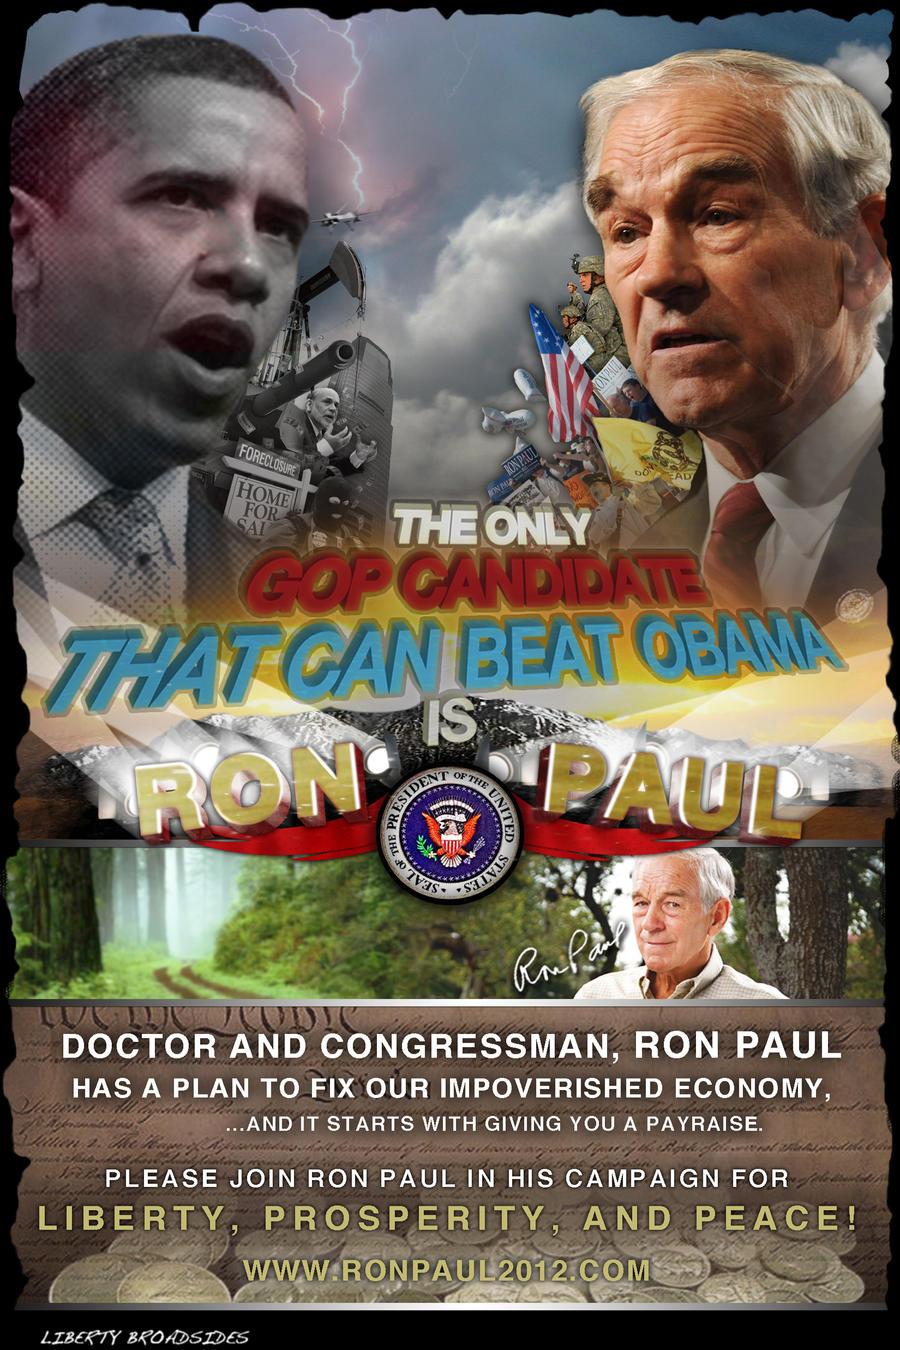 Ron Paul can beat Obama by LibertyBroadsides